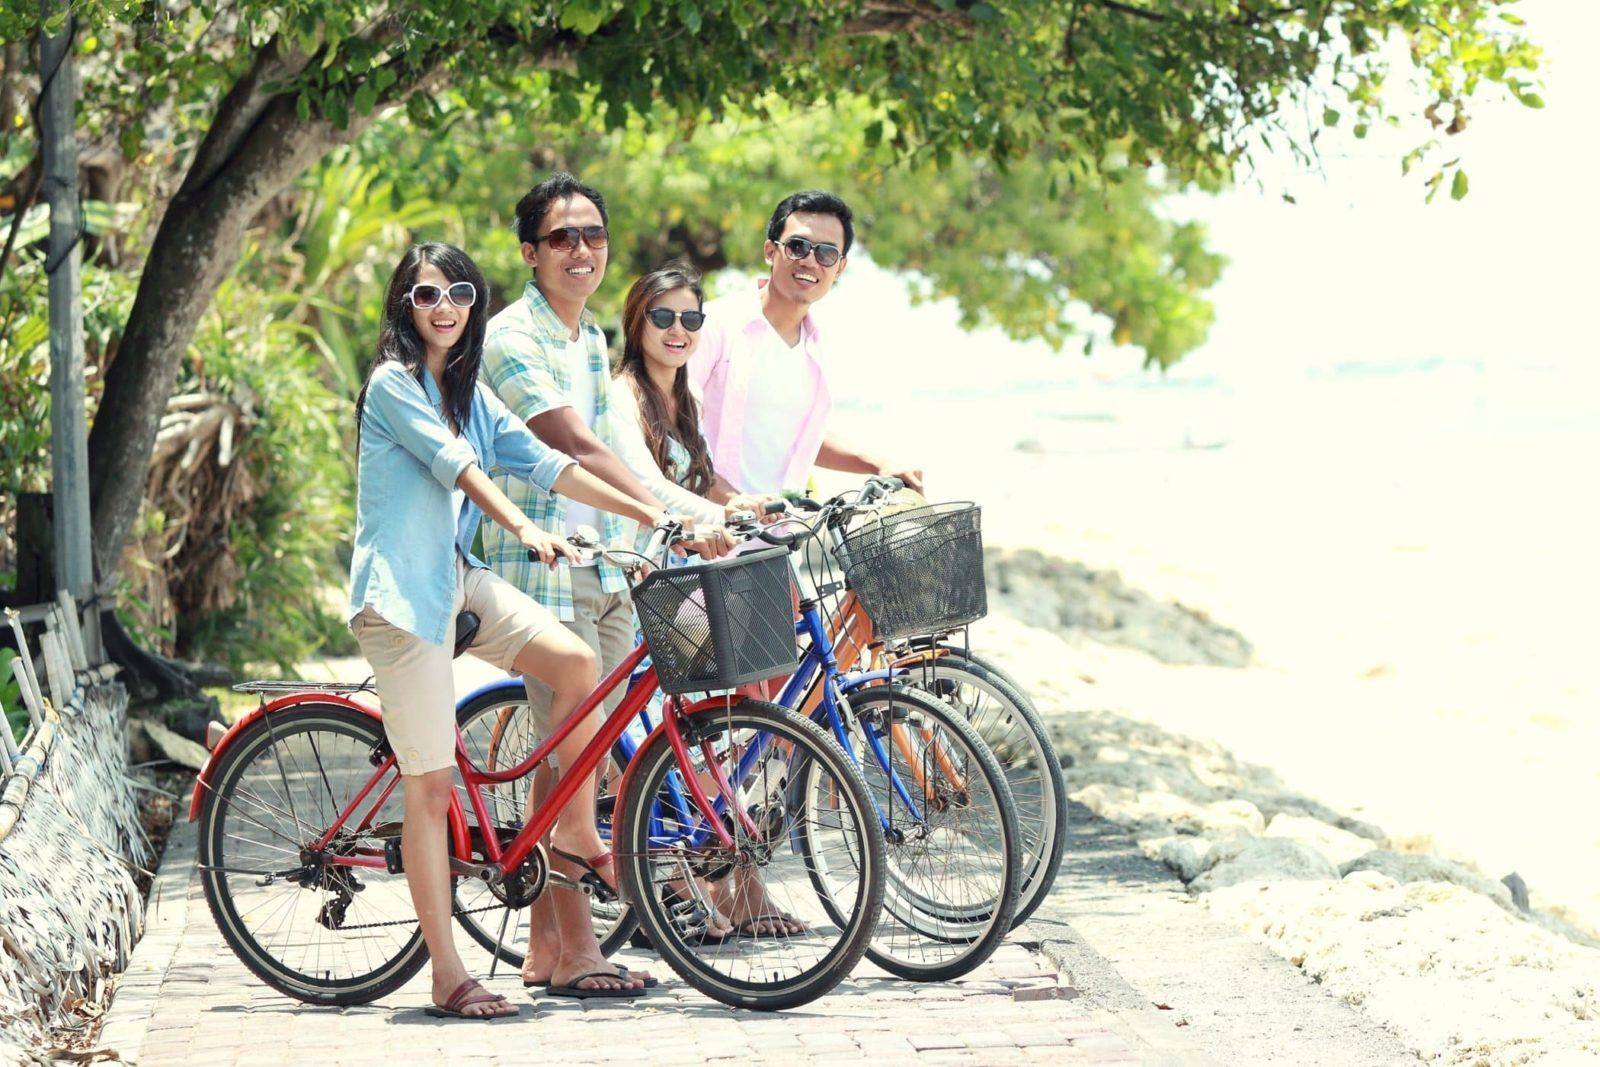 Beach bike rentals